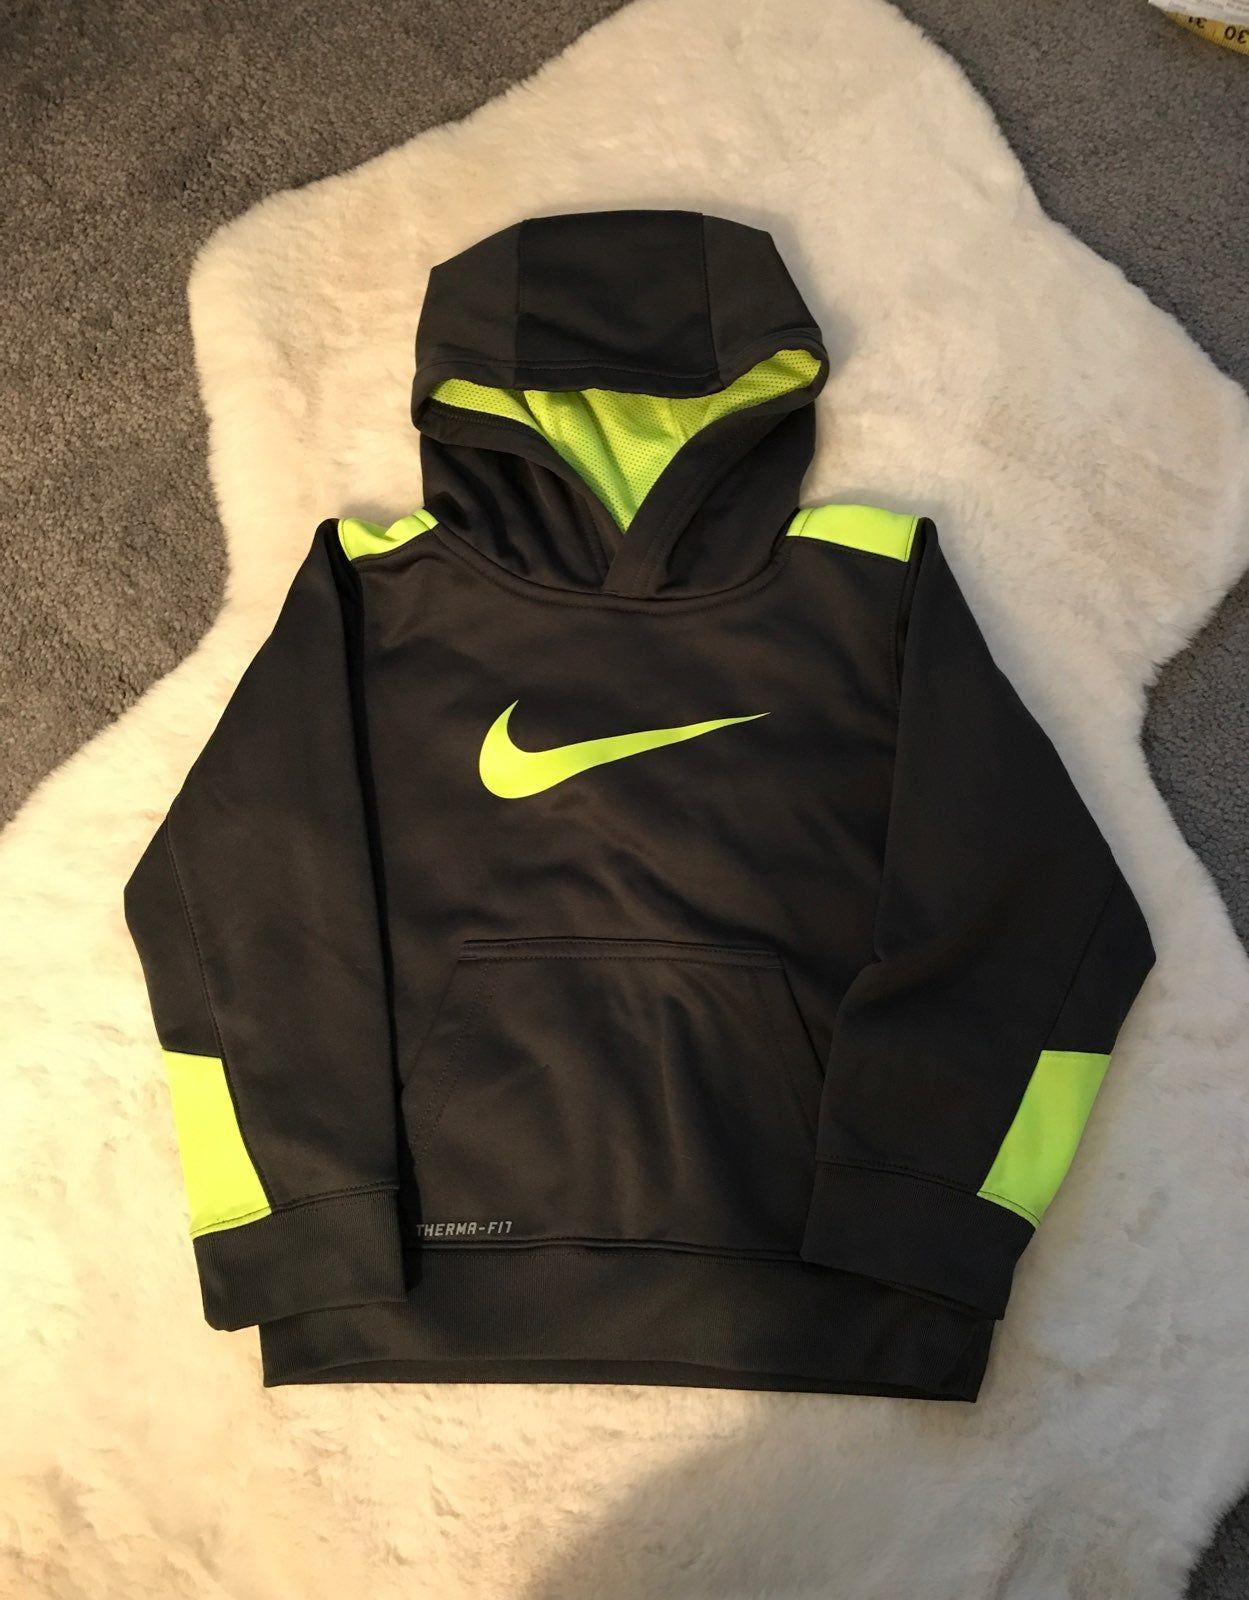 Boys Size 6 Nike Therma Fit Hooded Sweatshirt Dark Gray With Bright Yellow Smoke Free Home Nike Sweatshirts Nike Hoodie [ 1600 x 1249 Pixel ]